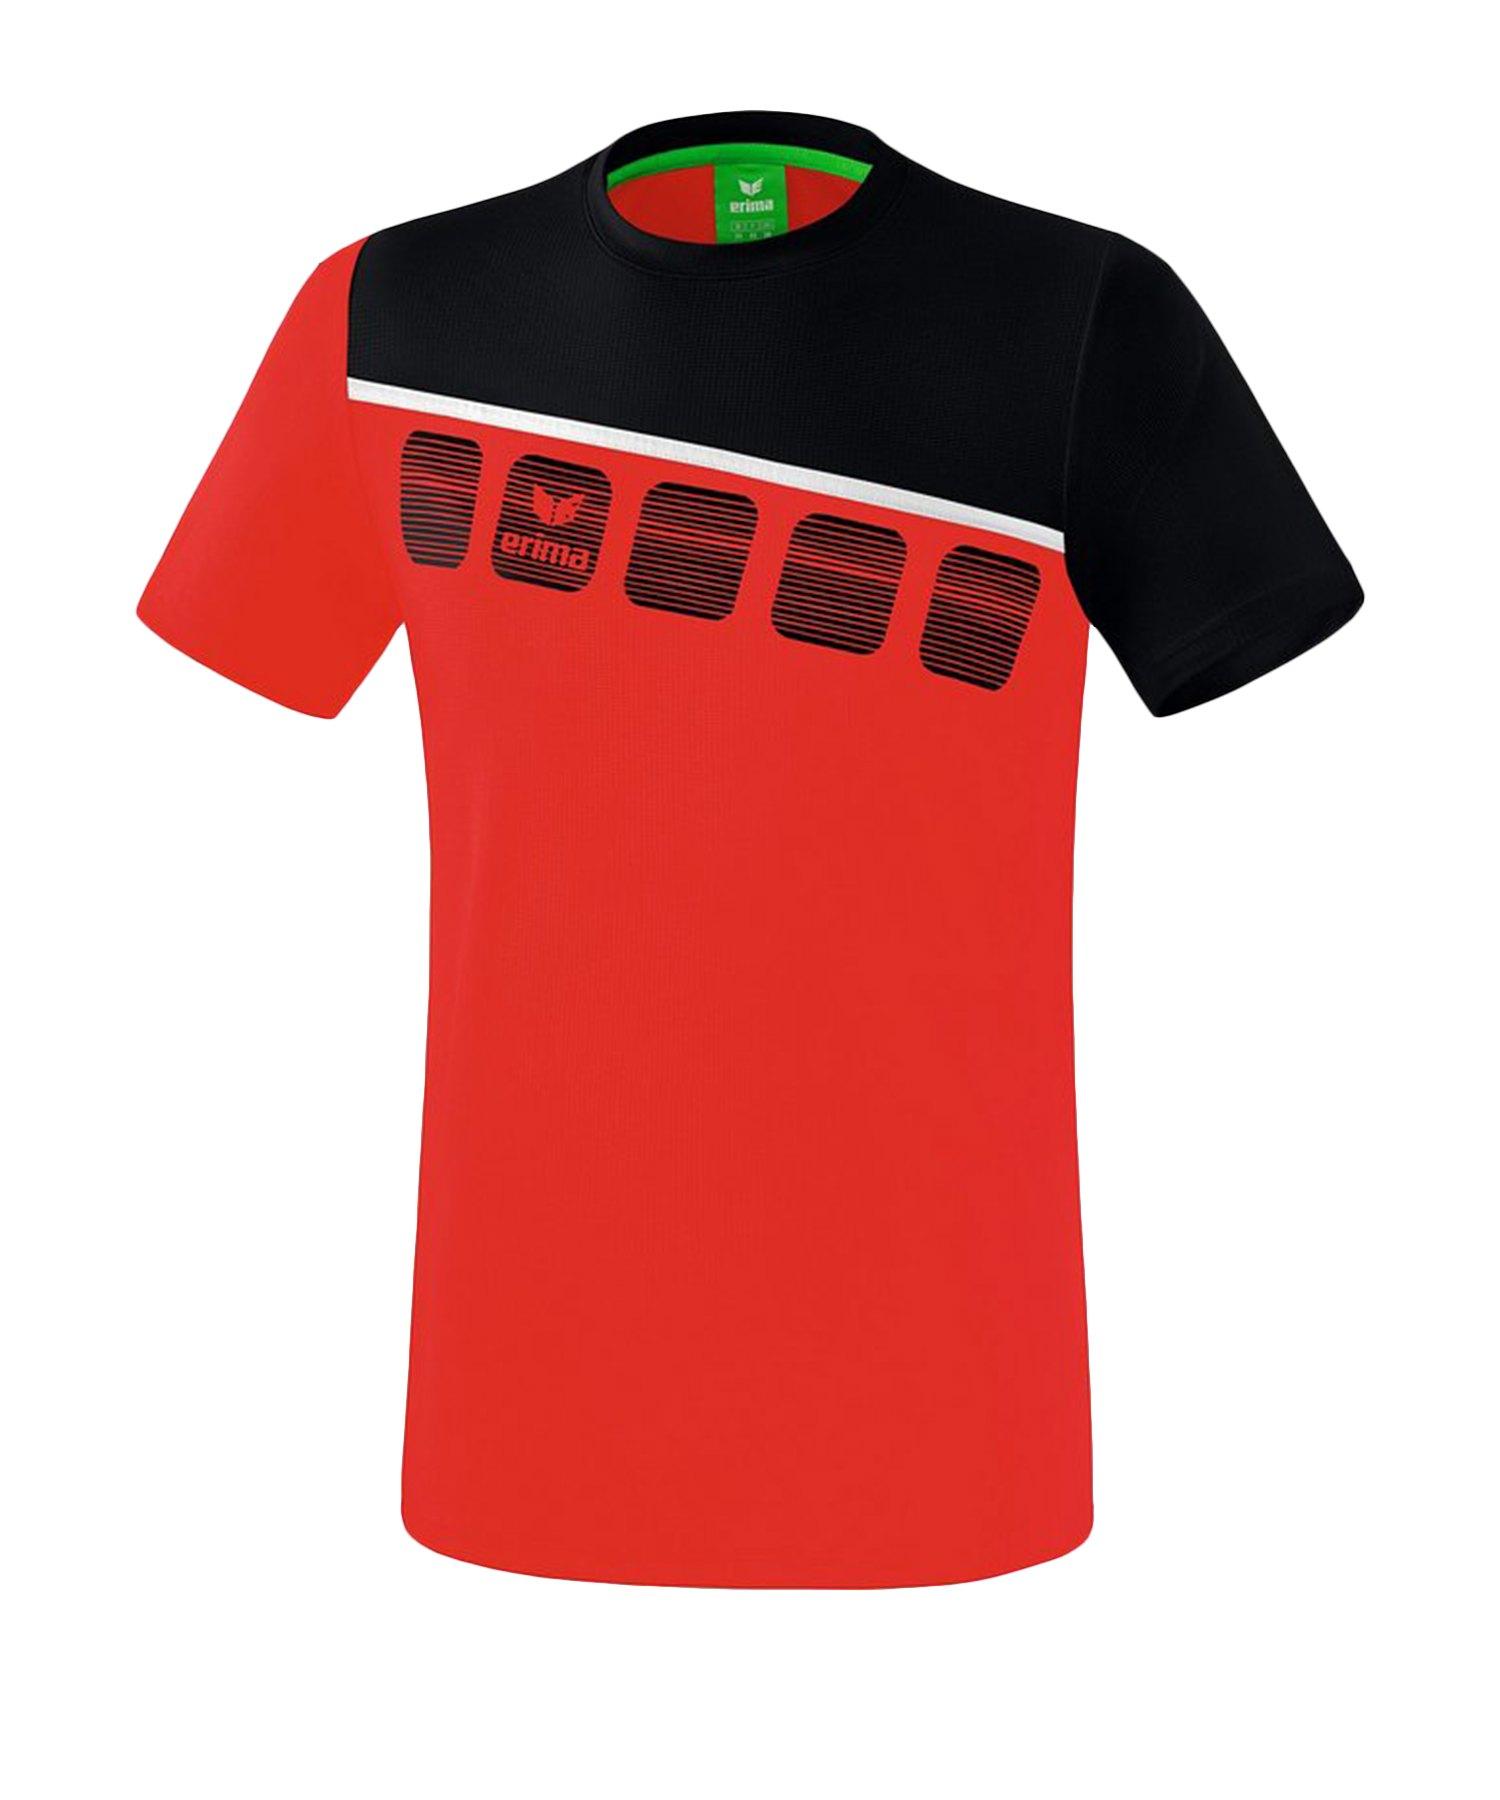 Erima 5-C T-Shirt Kids Rot Schwarz - Rot